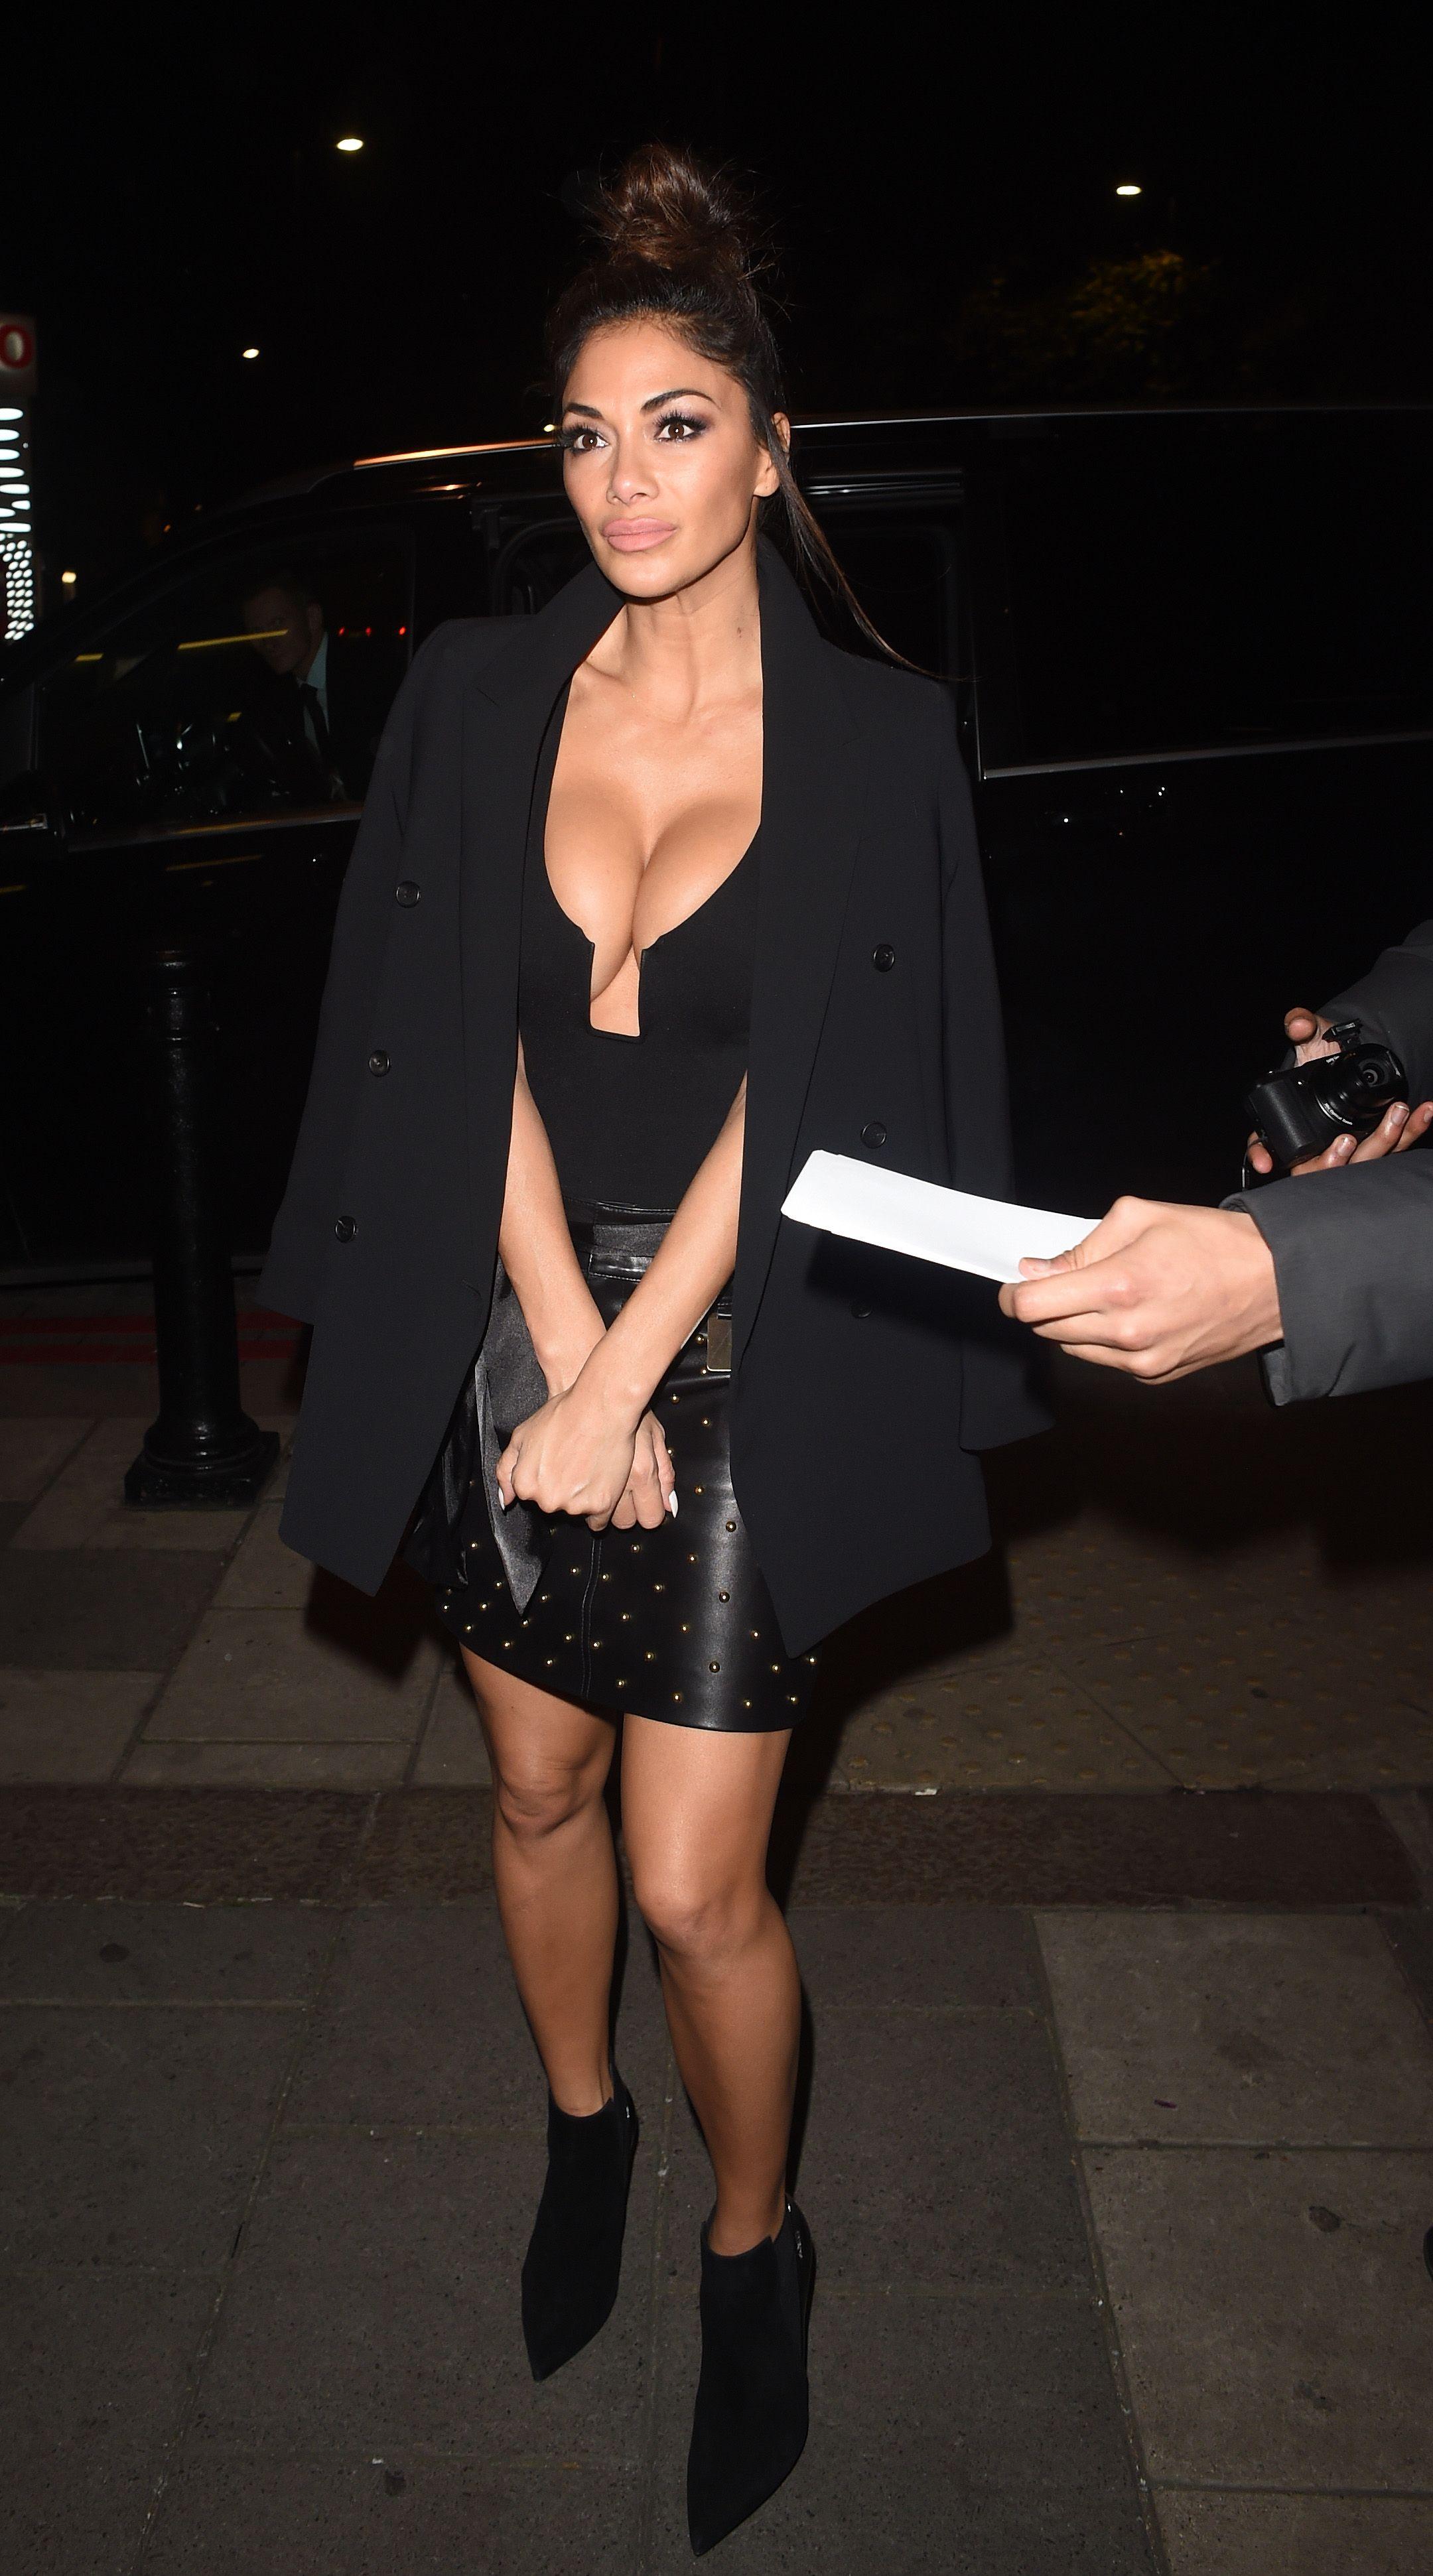 Nicole Scherzinger Cleava...